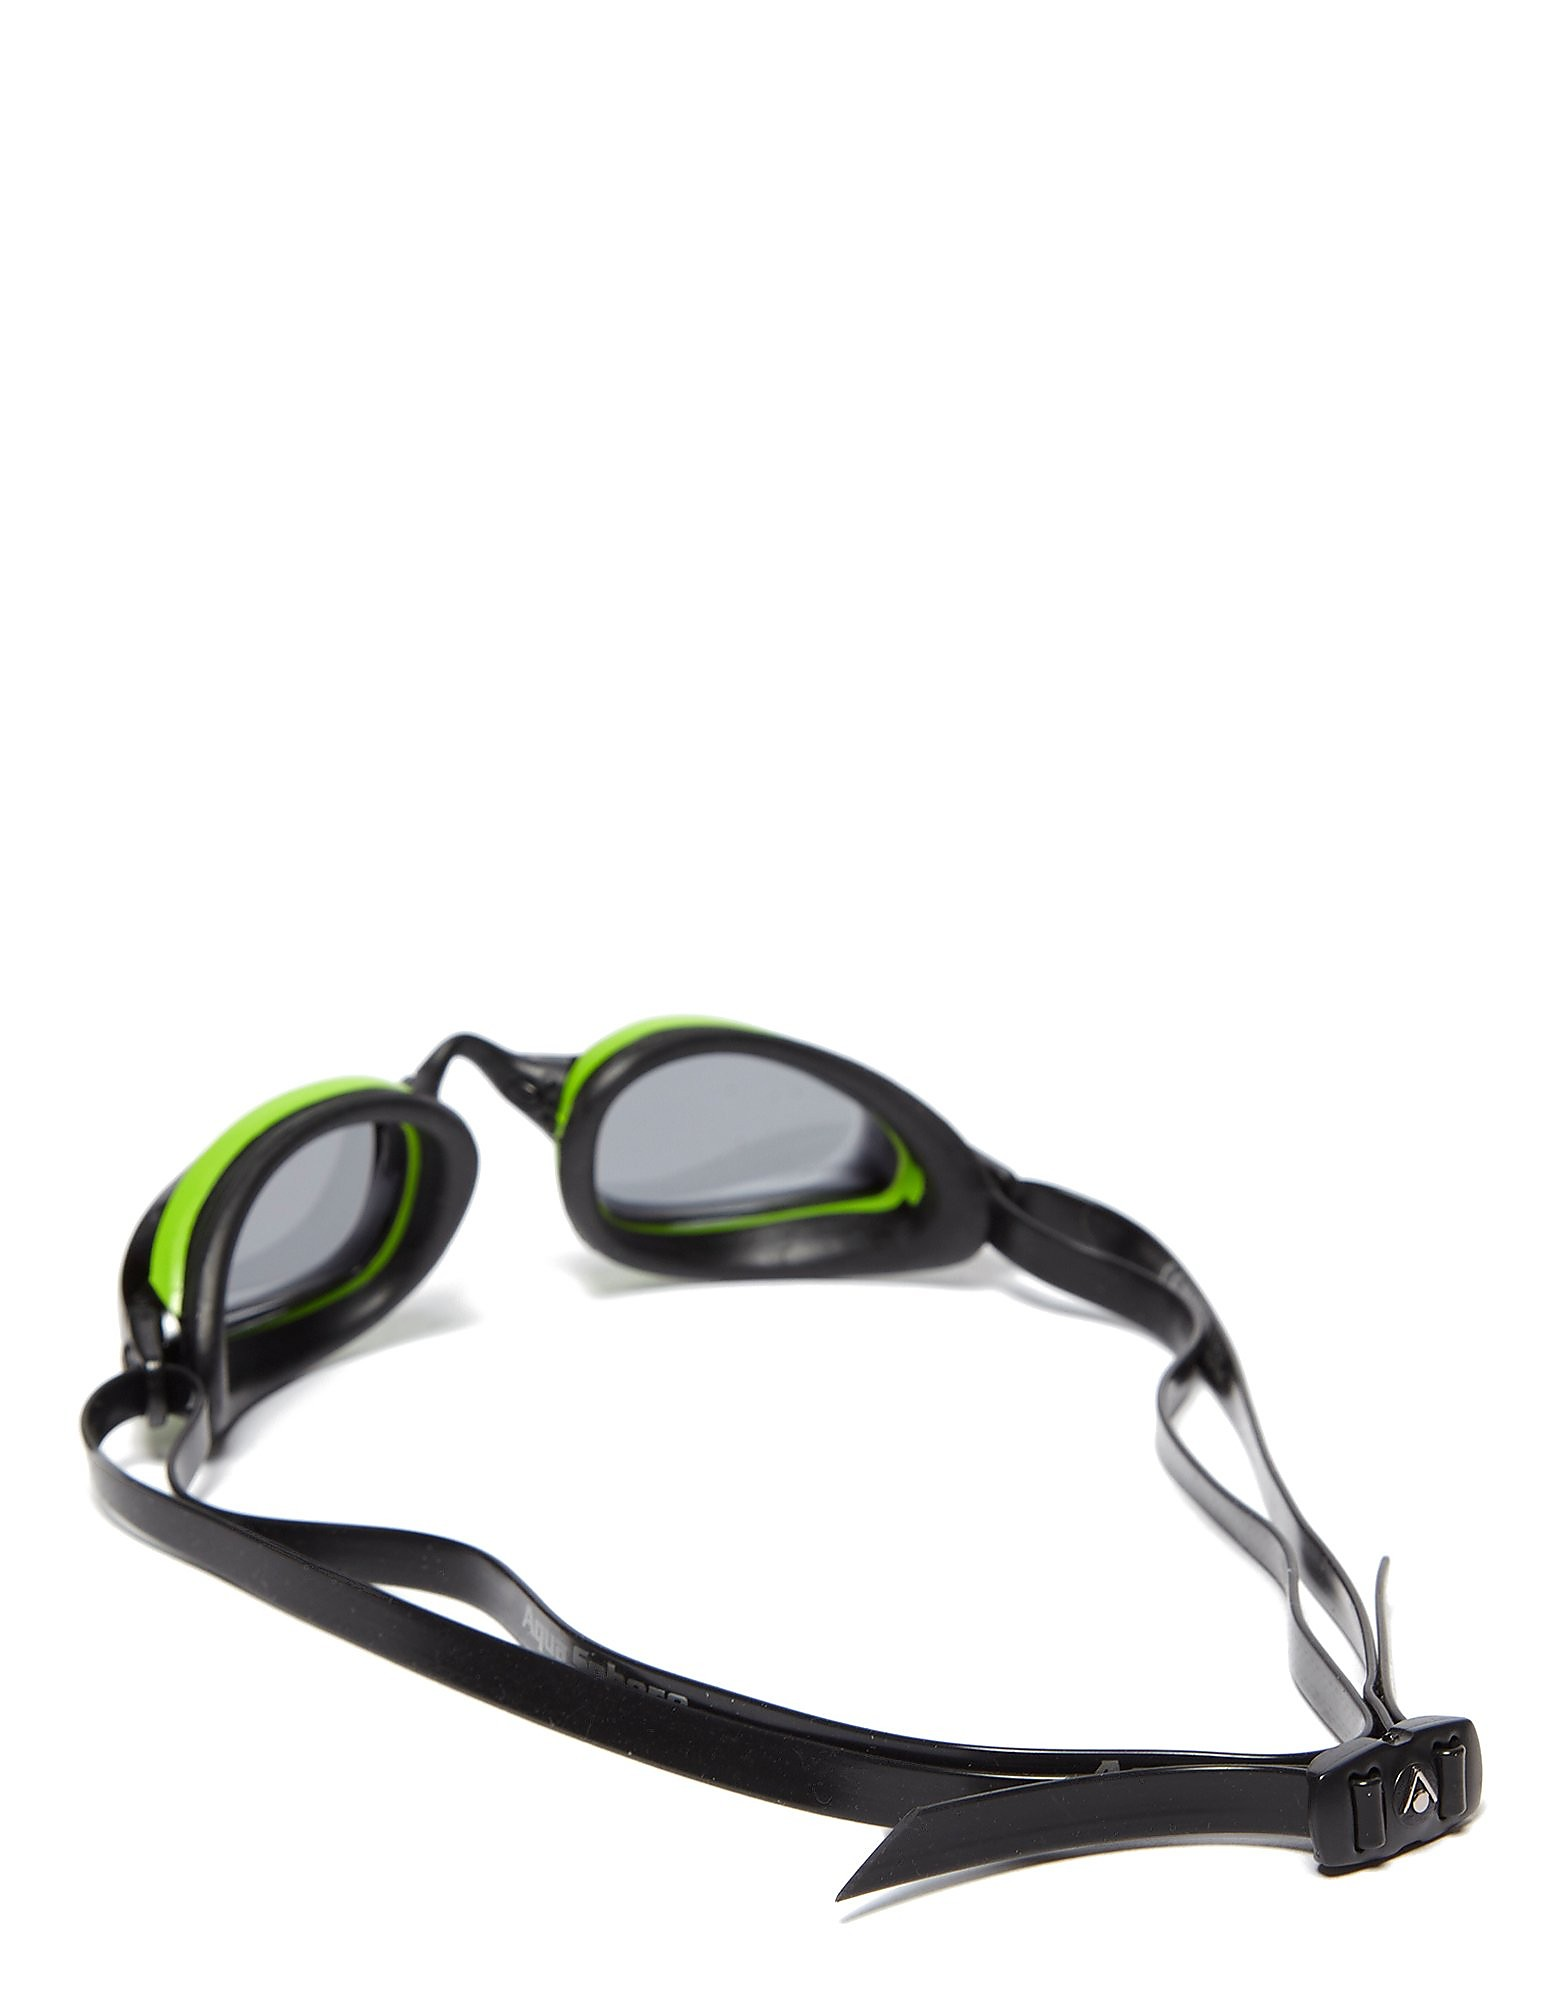 MP - Michael Phelps K180+ Goggles (Dark Lens)